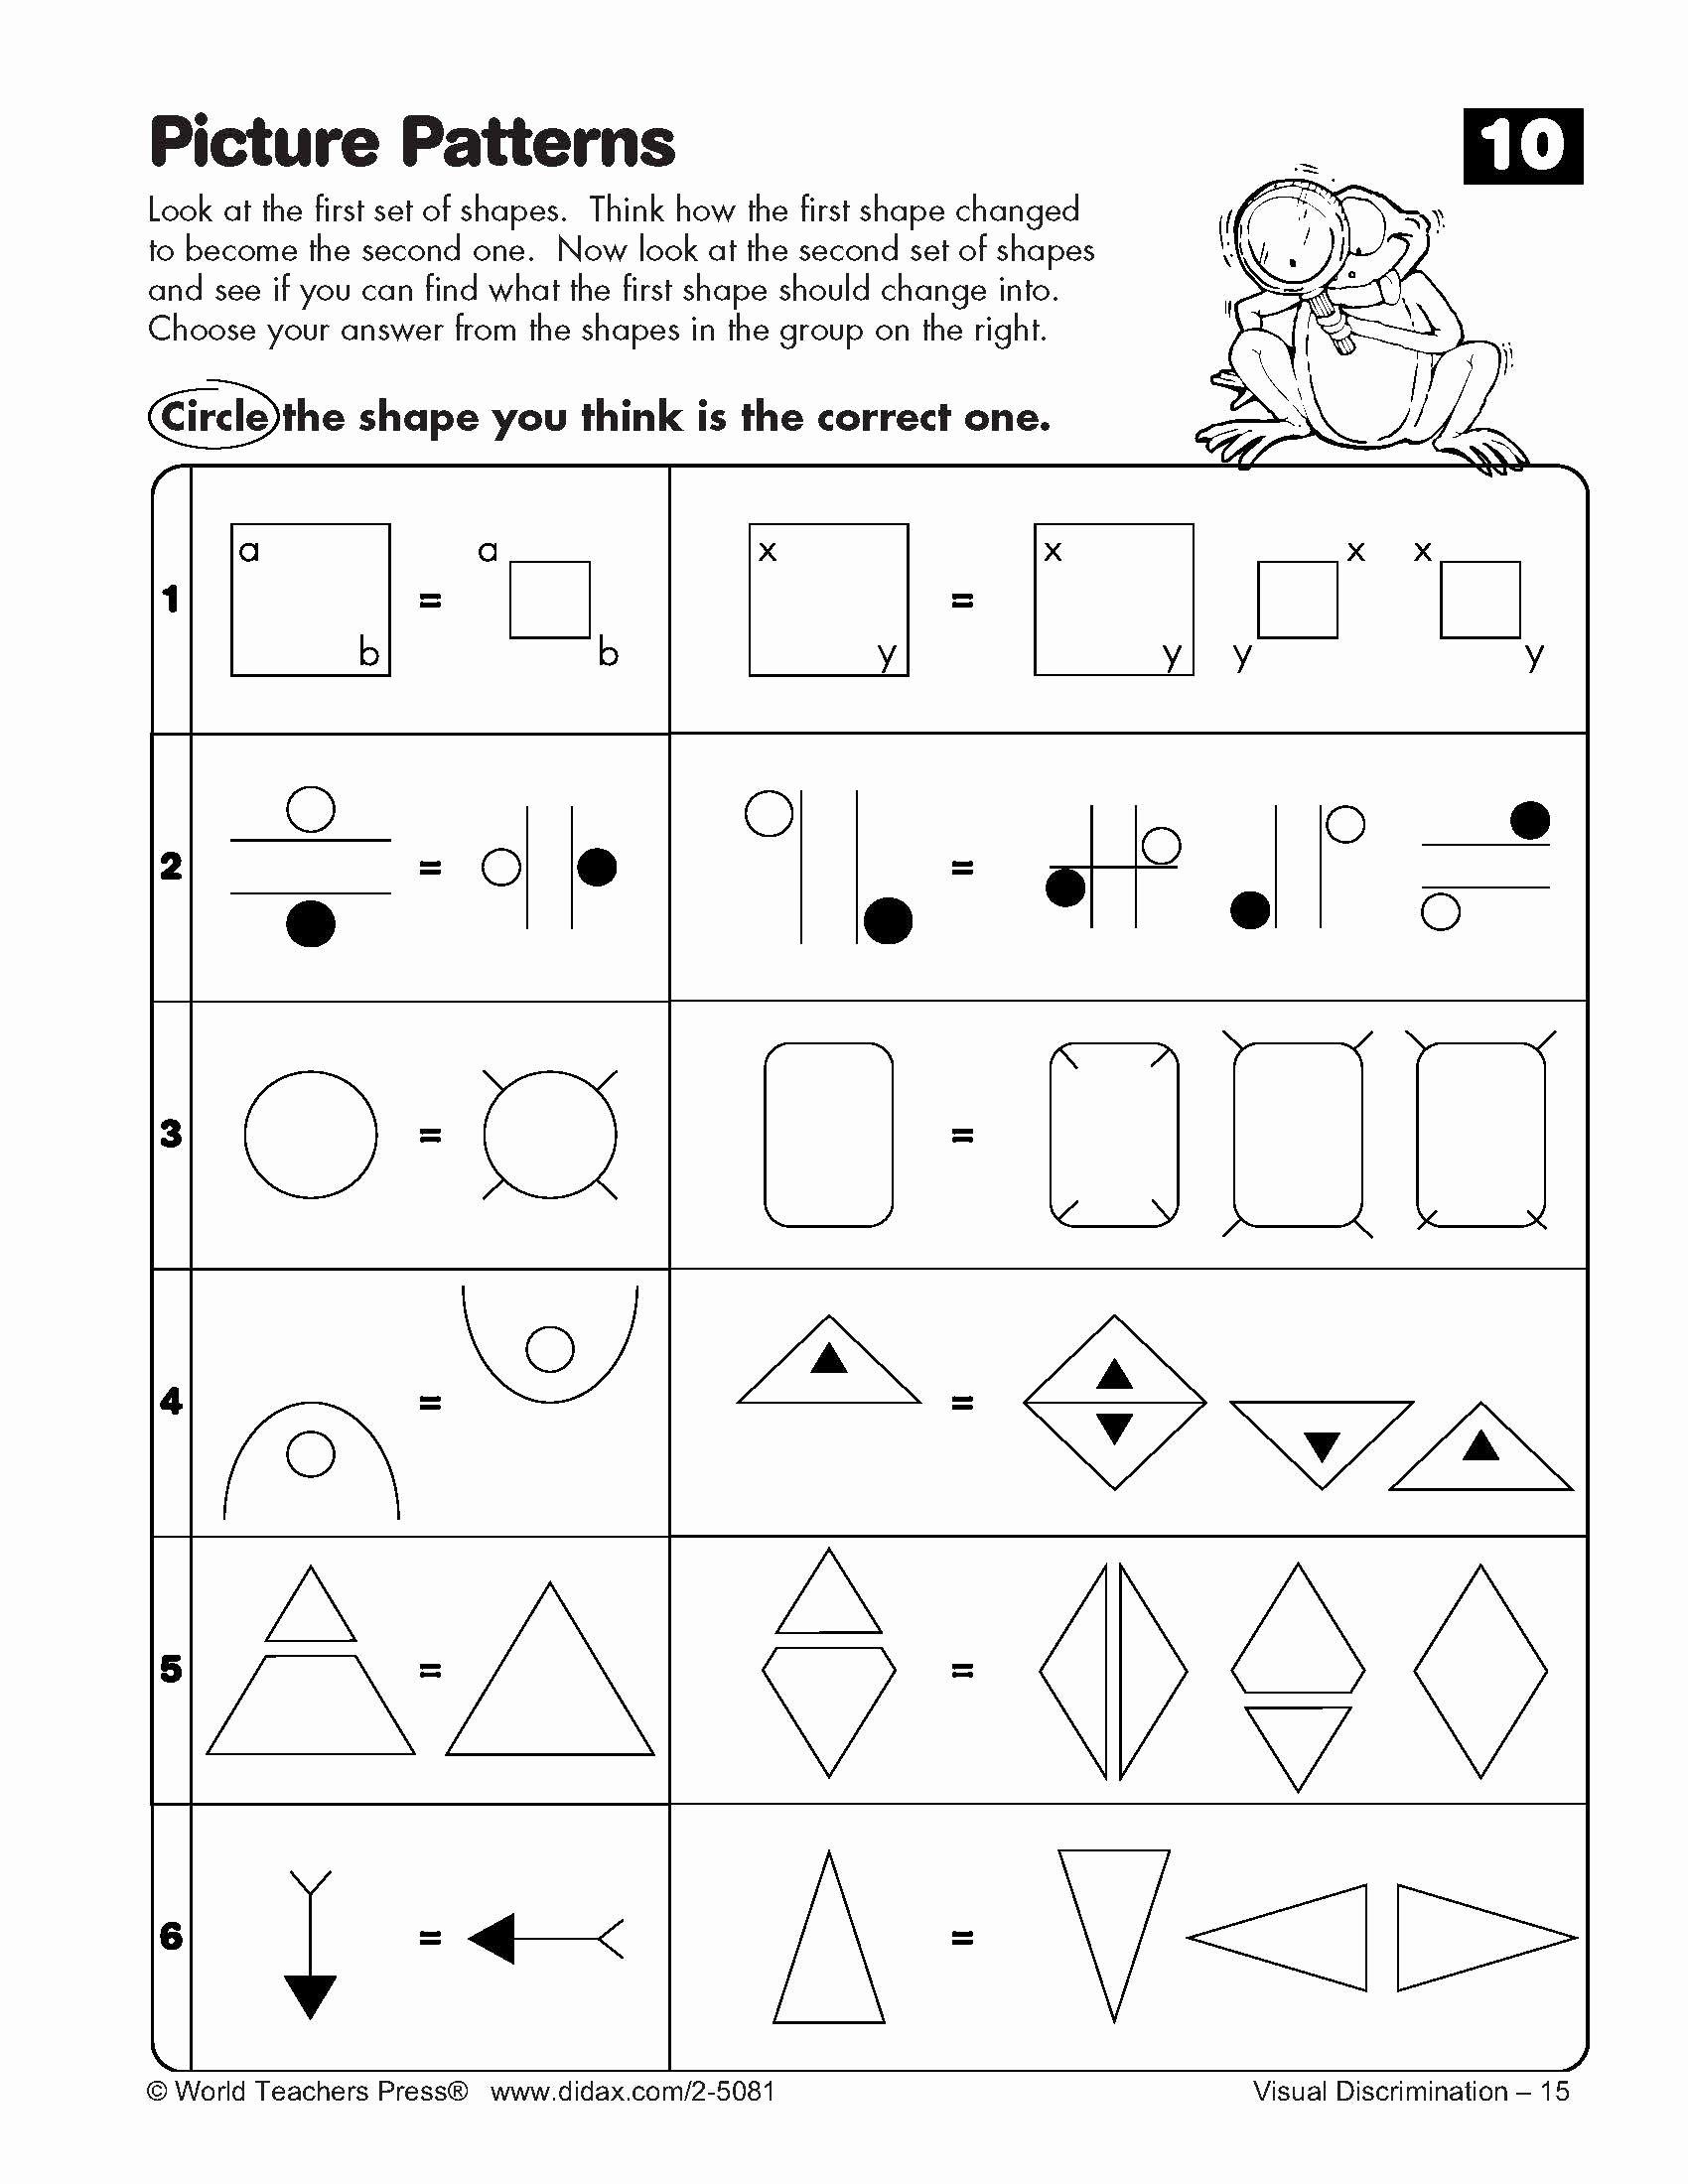 Visual Discrimination Worksheets for Preschoolers Free Visual Discrimination